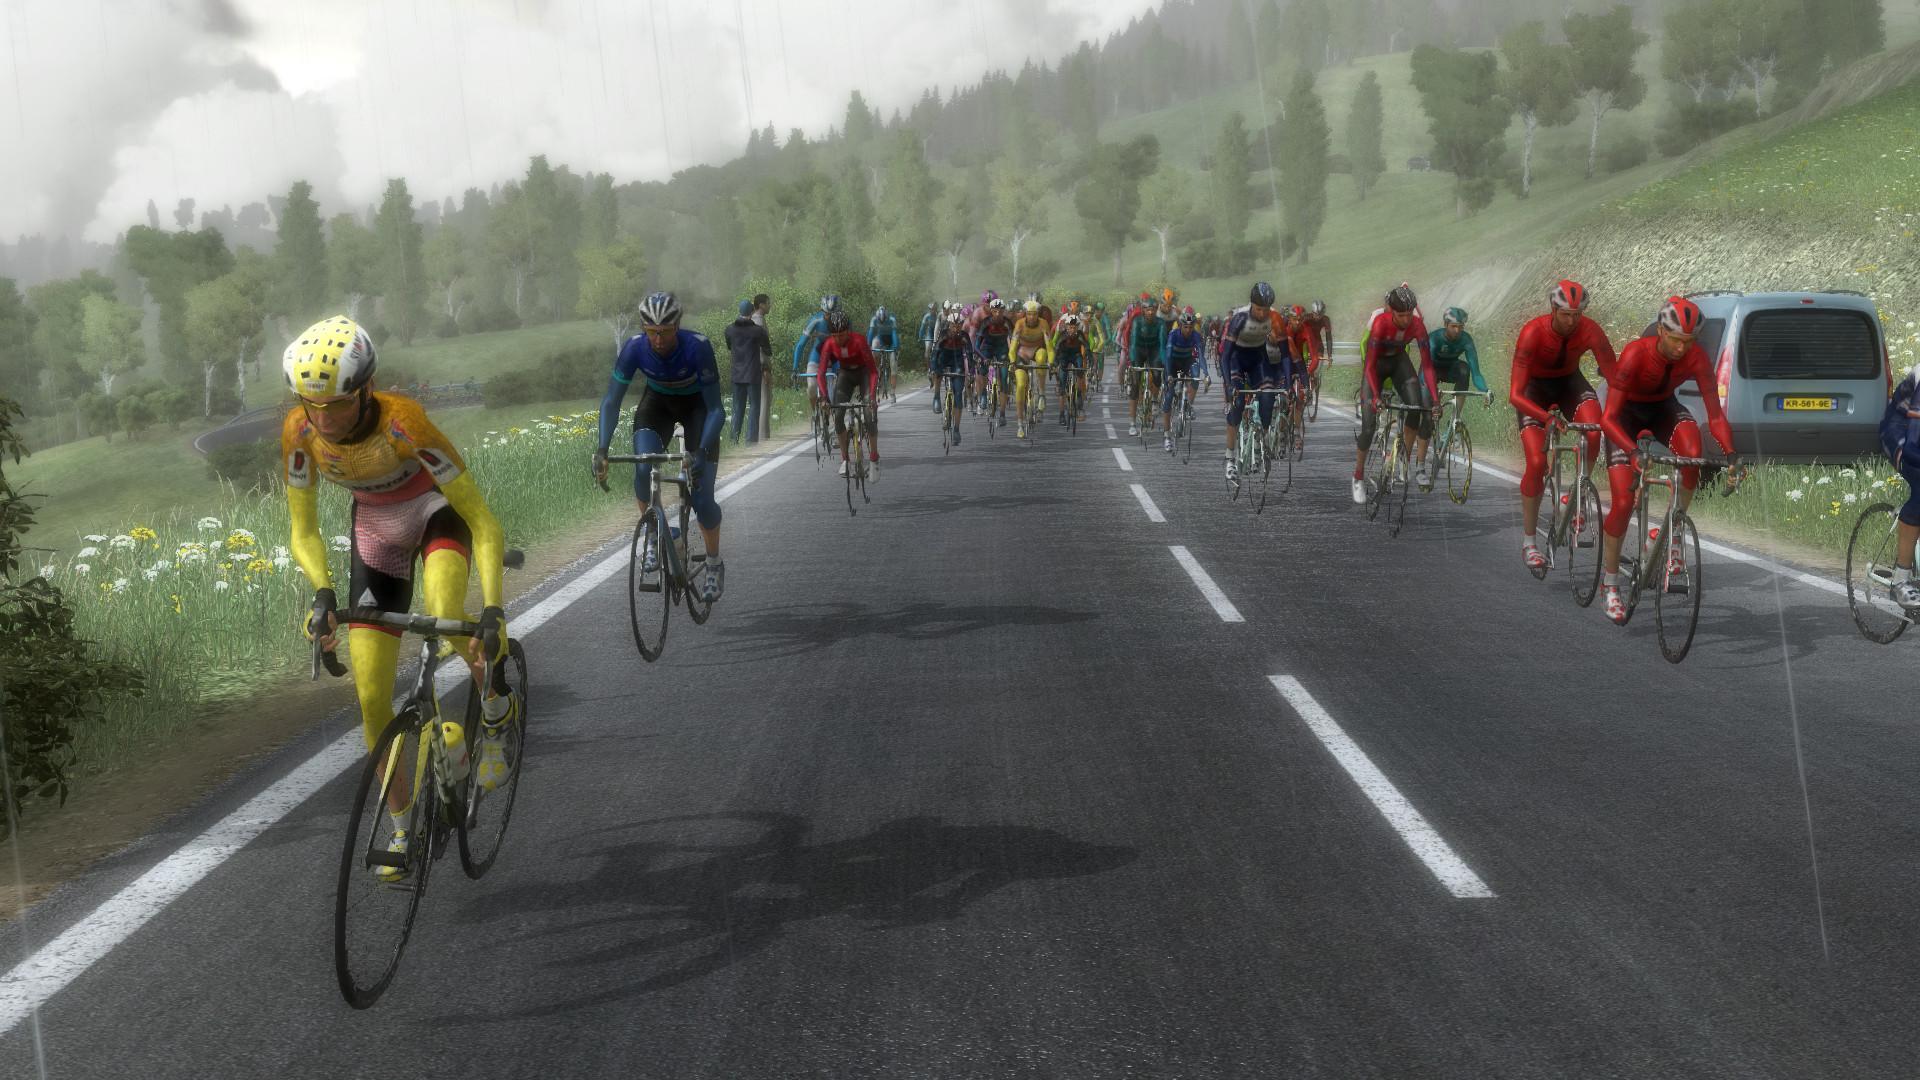 pcmdaily.com/images/mg/2019/Races/PTHC/Pologne/E5/21.jpg